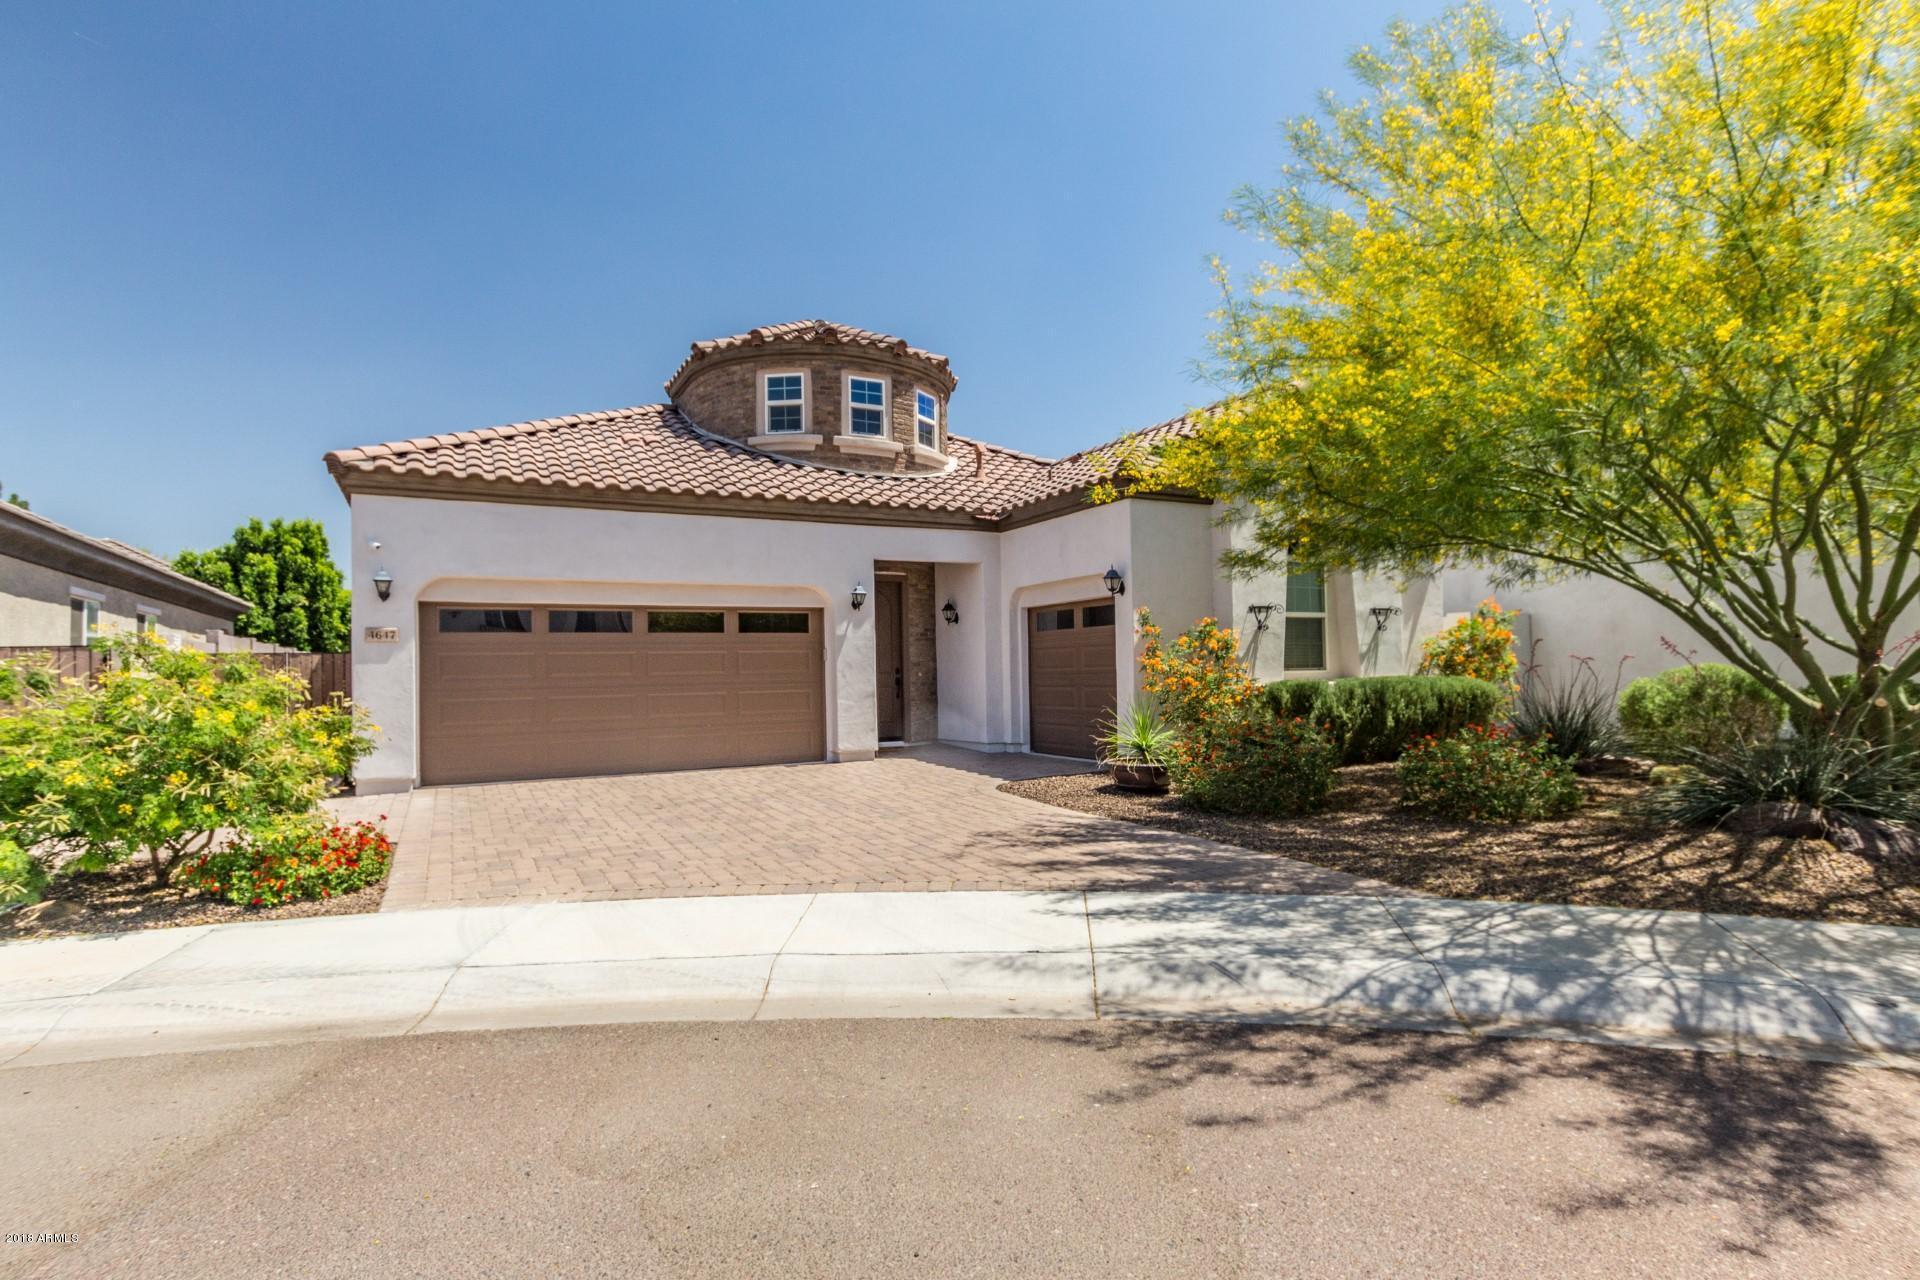 4647 N 29TH Street, Phoenix AZ 85016